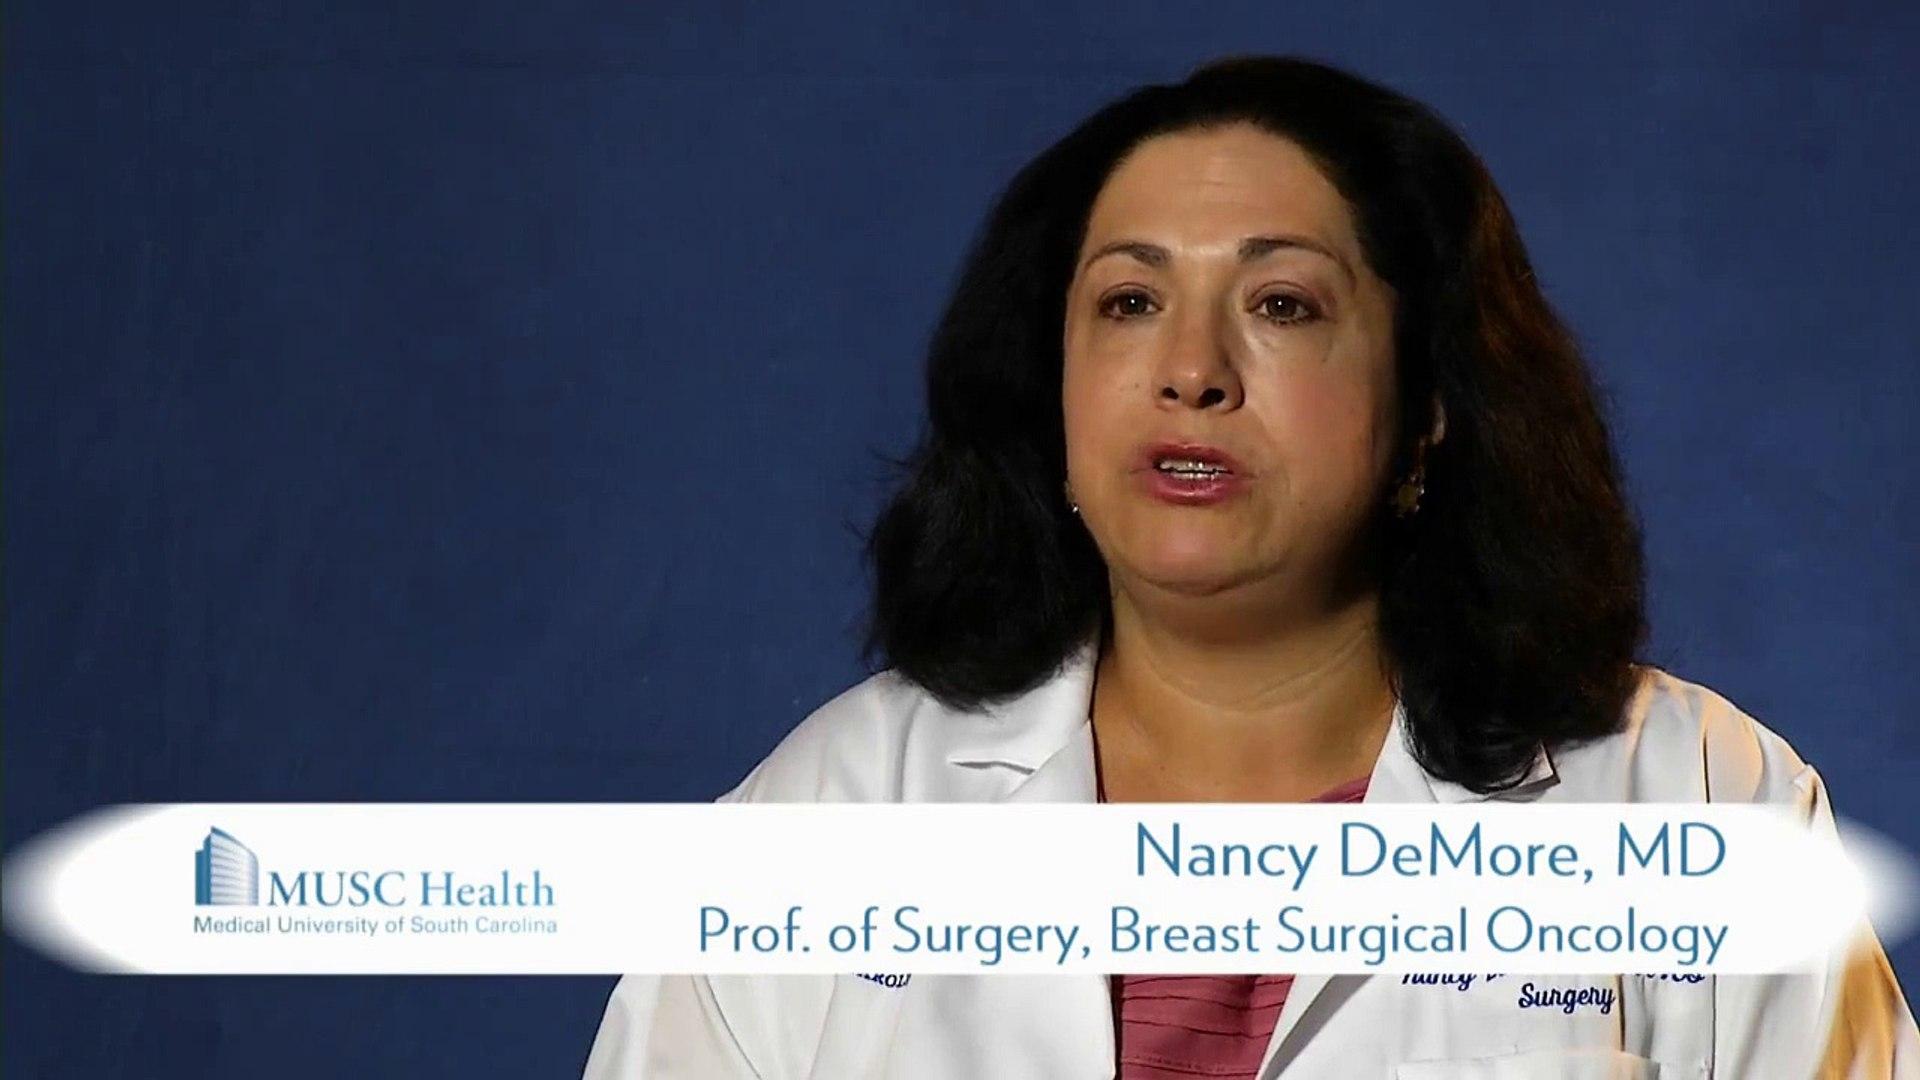 Meet Nancy DeMore, M D  a Breast Cancer Surgeon at MUSC Health